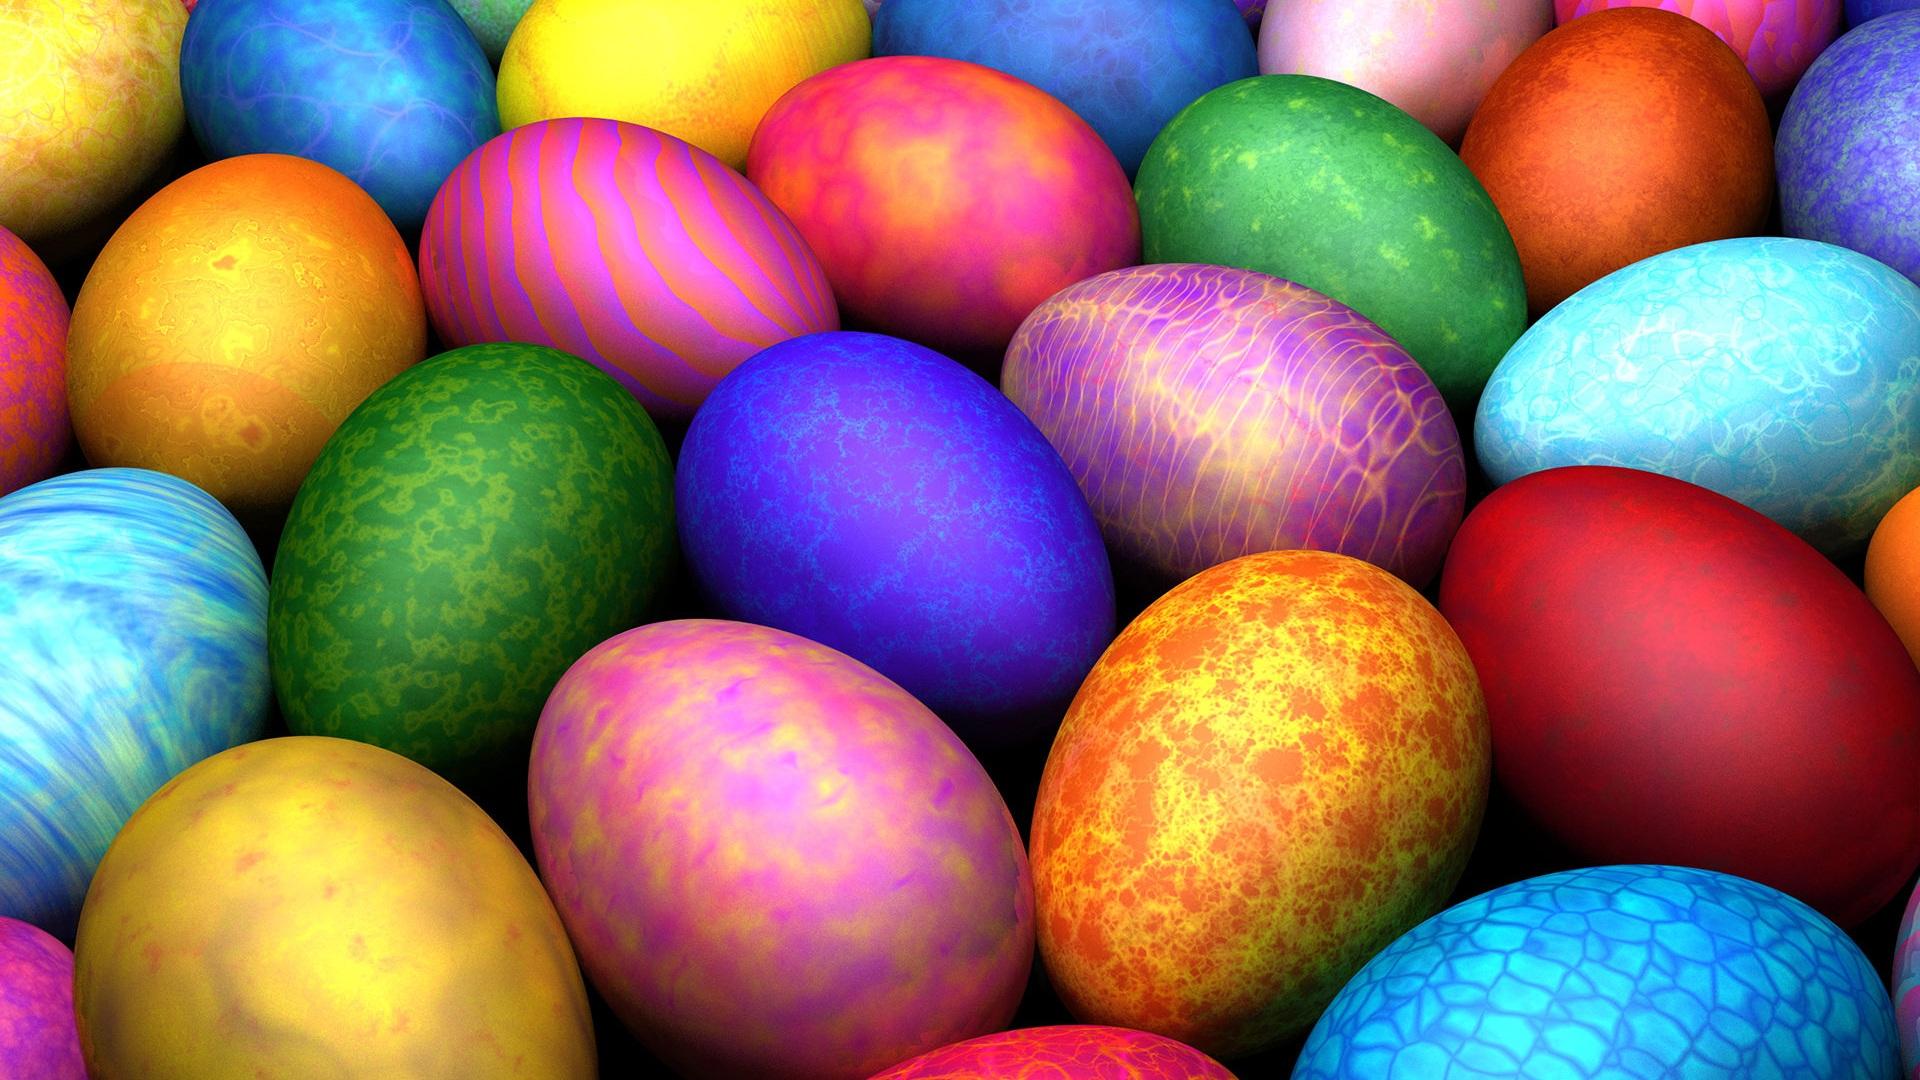 Easter Wallpaper 6832103 1920x1080